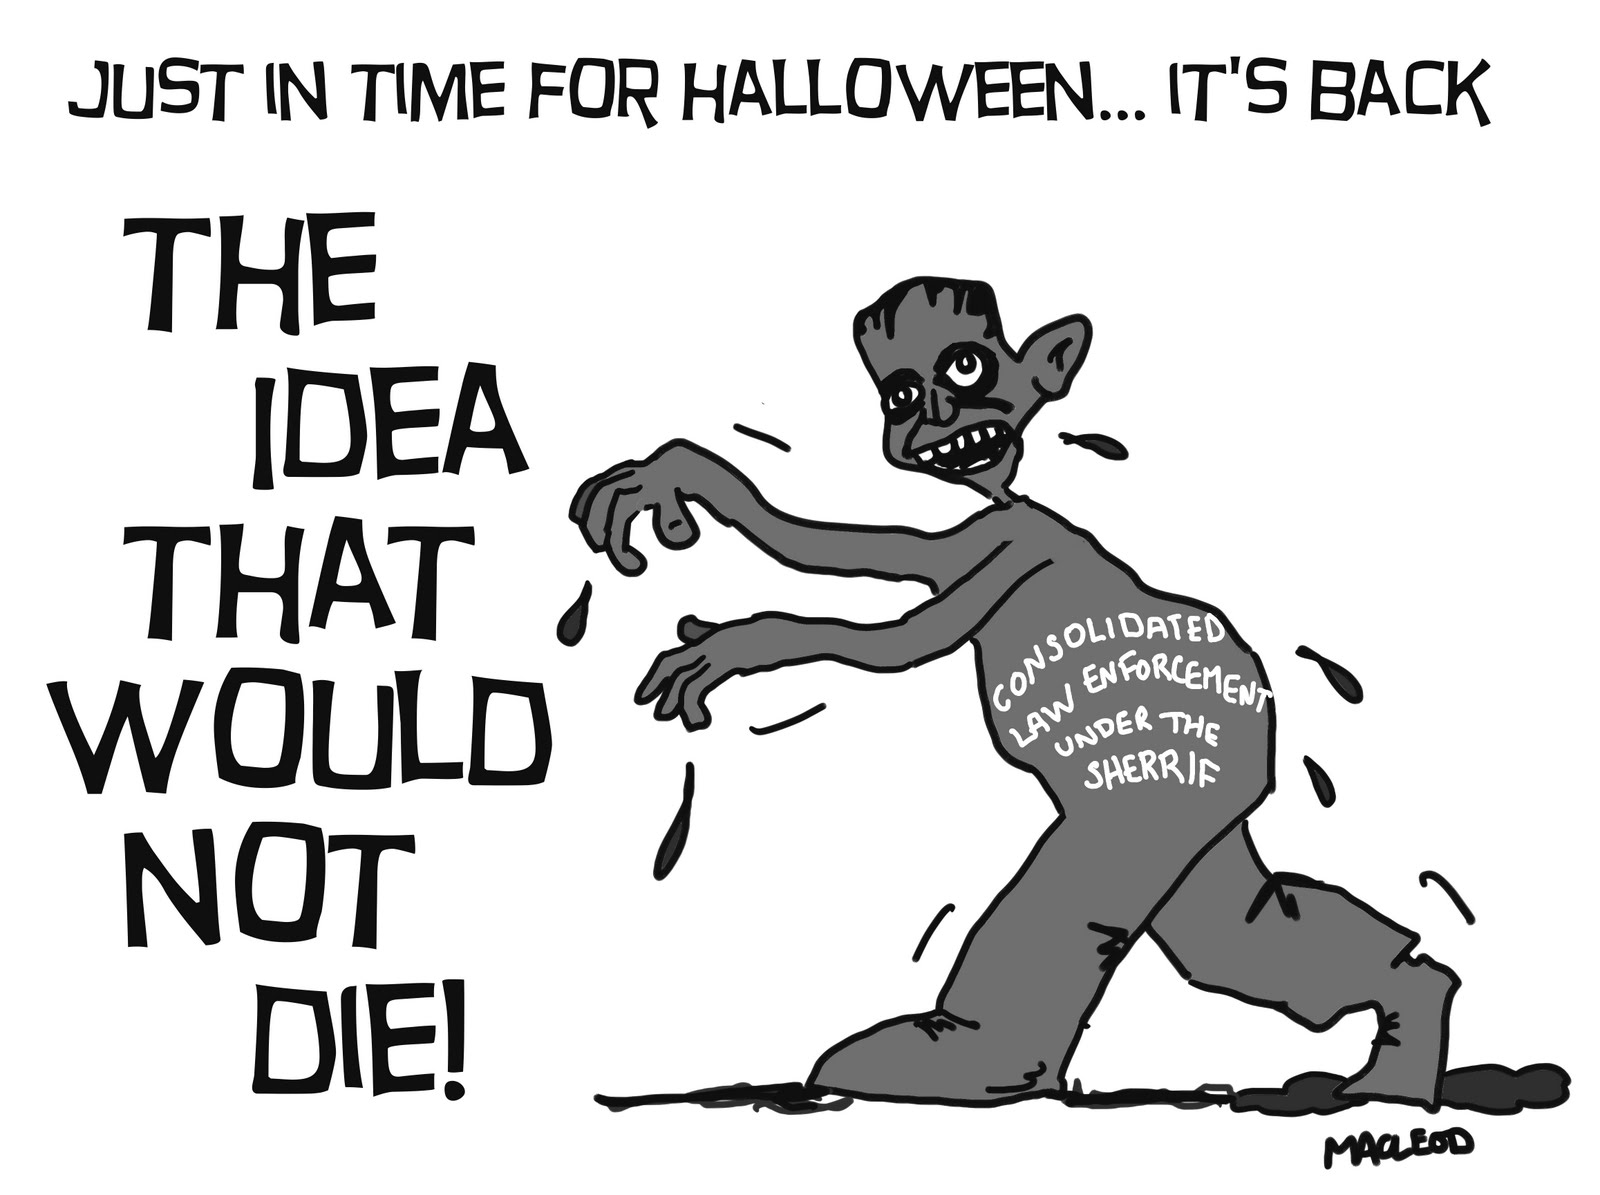 MacLeod Cartoons: Law Enforcement Consolidation Evansville